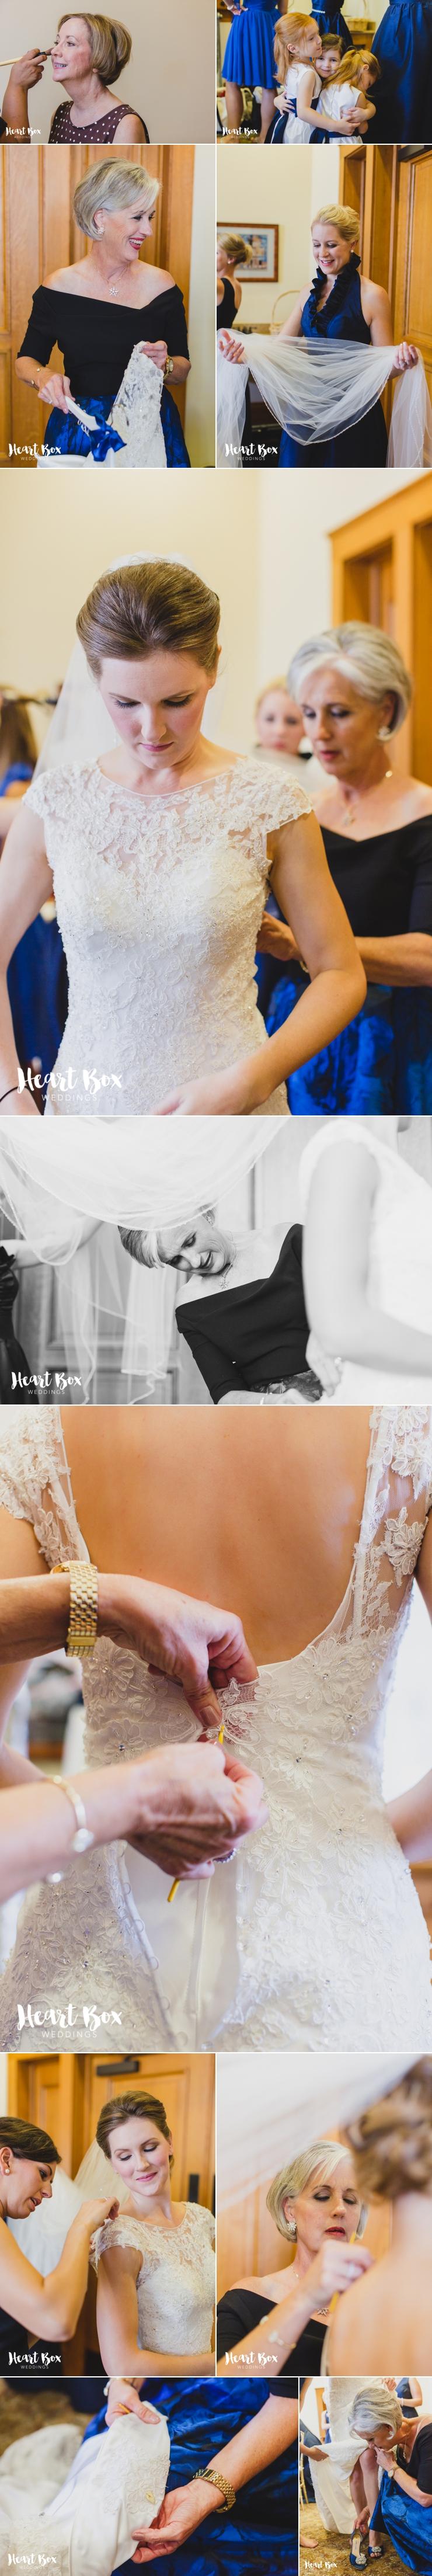 Anthony Wedding Blog Collages 4.jpg